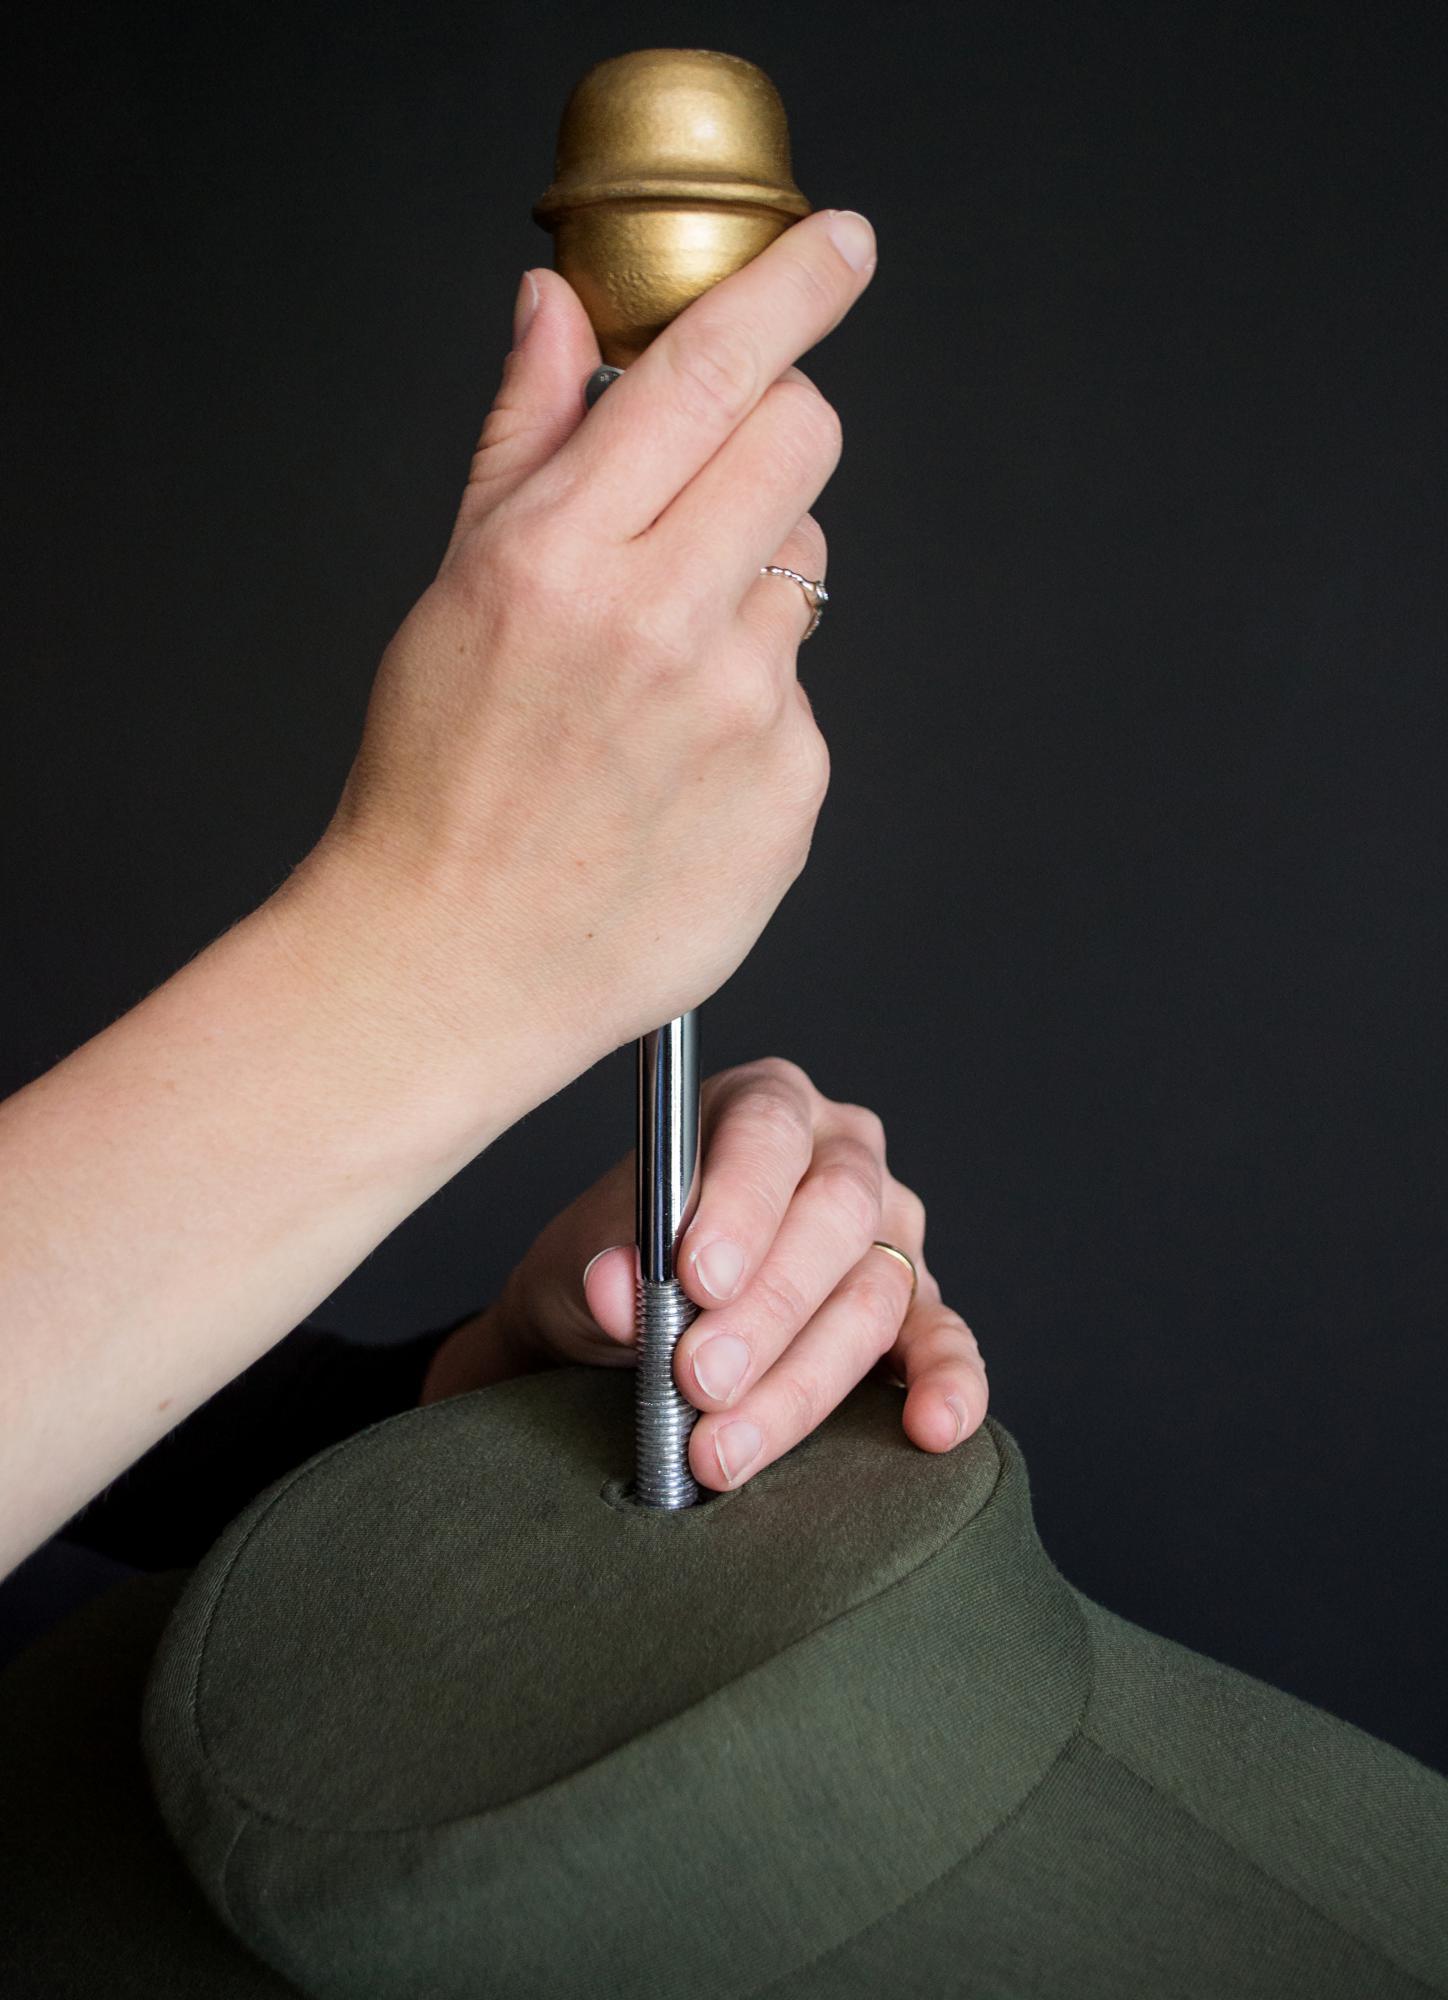 Крепление манекена за шею